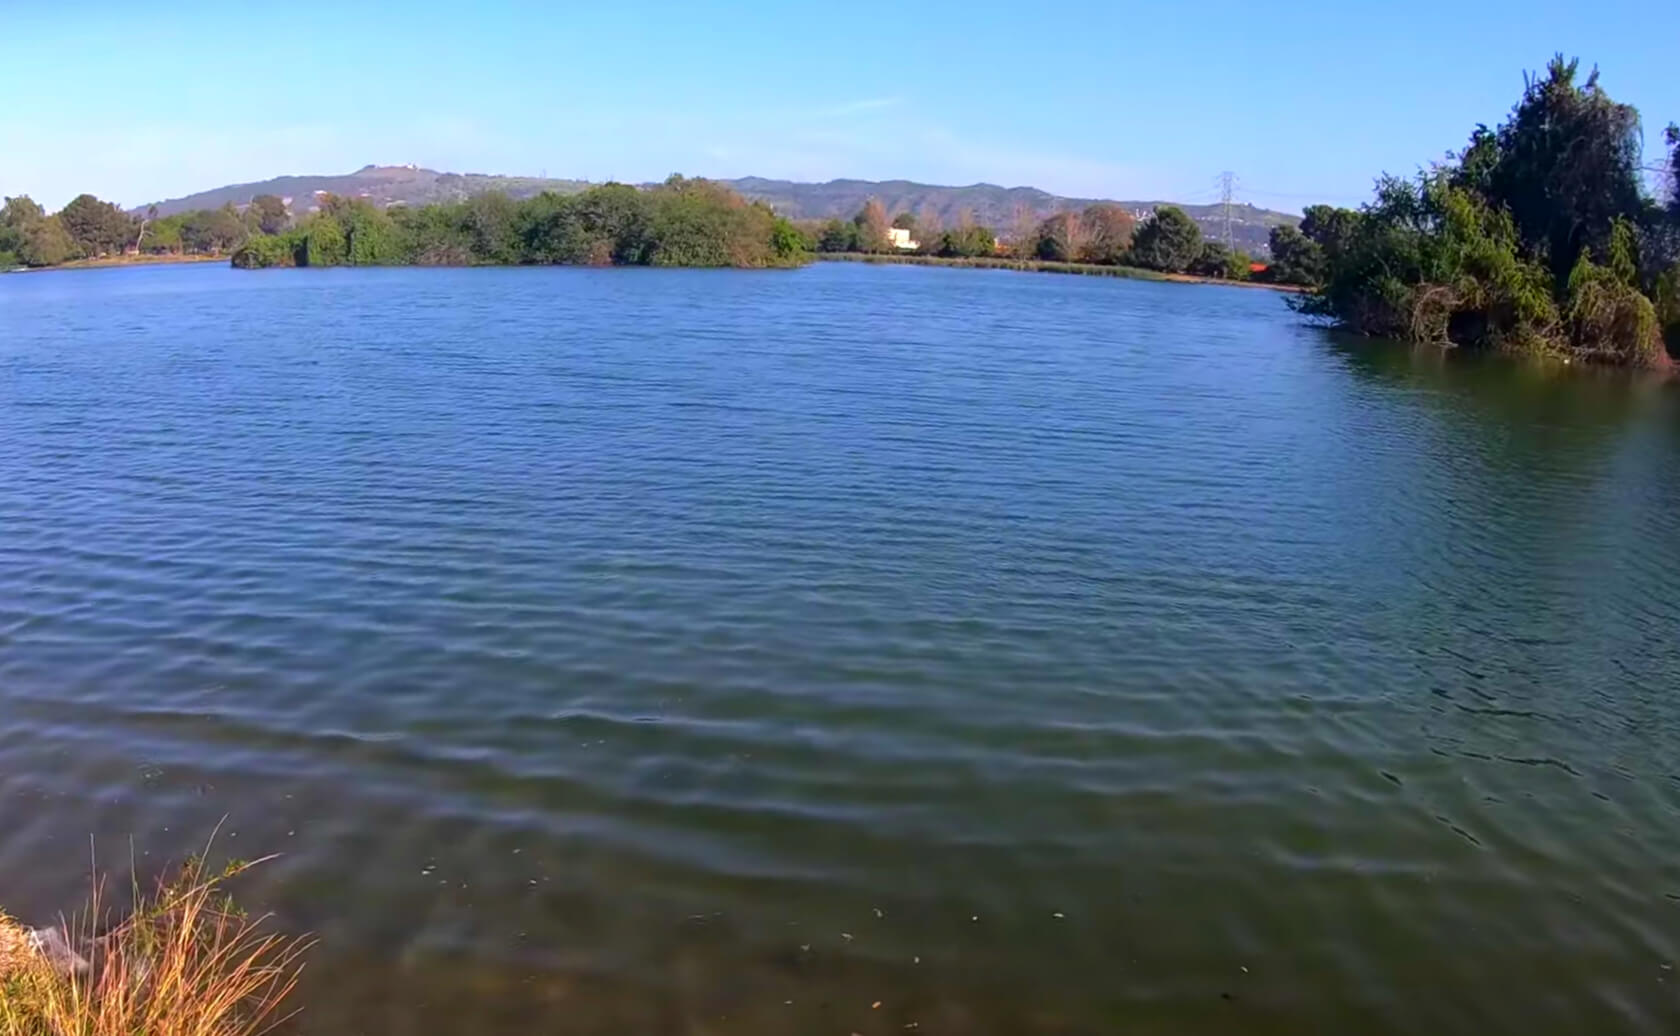 Legg-Lake-Fishing-Guide-Report-South-El-Monte-CA-91733-04